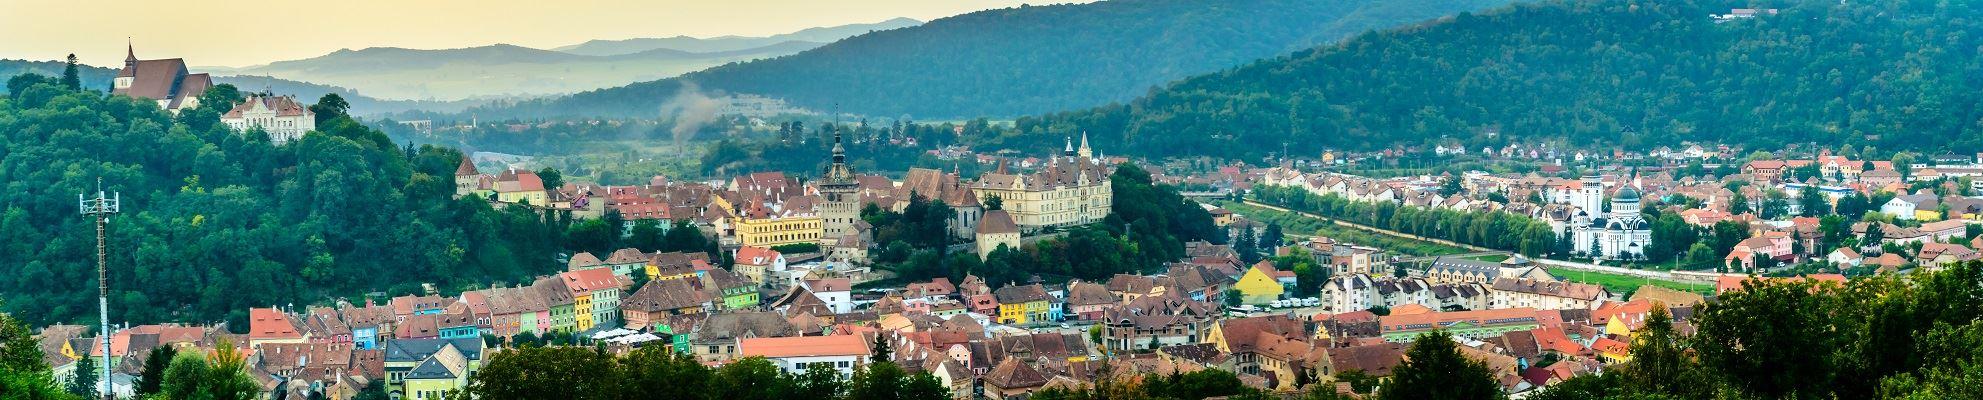 transylvanie-sighisoara-panorama